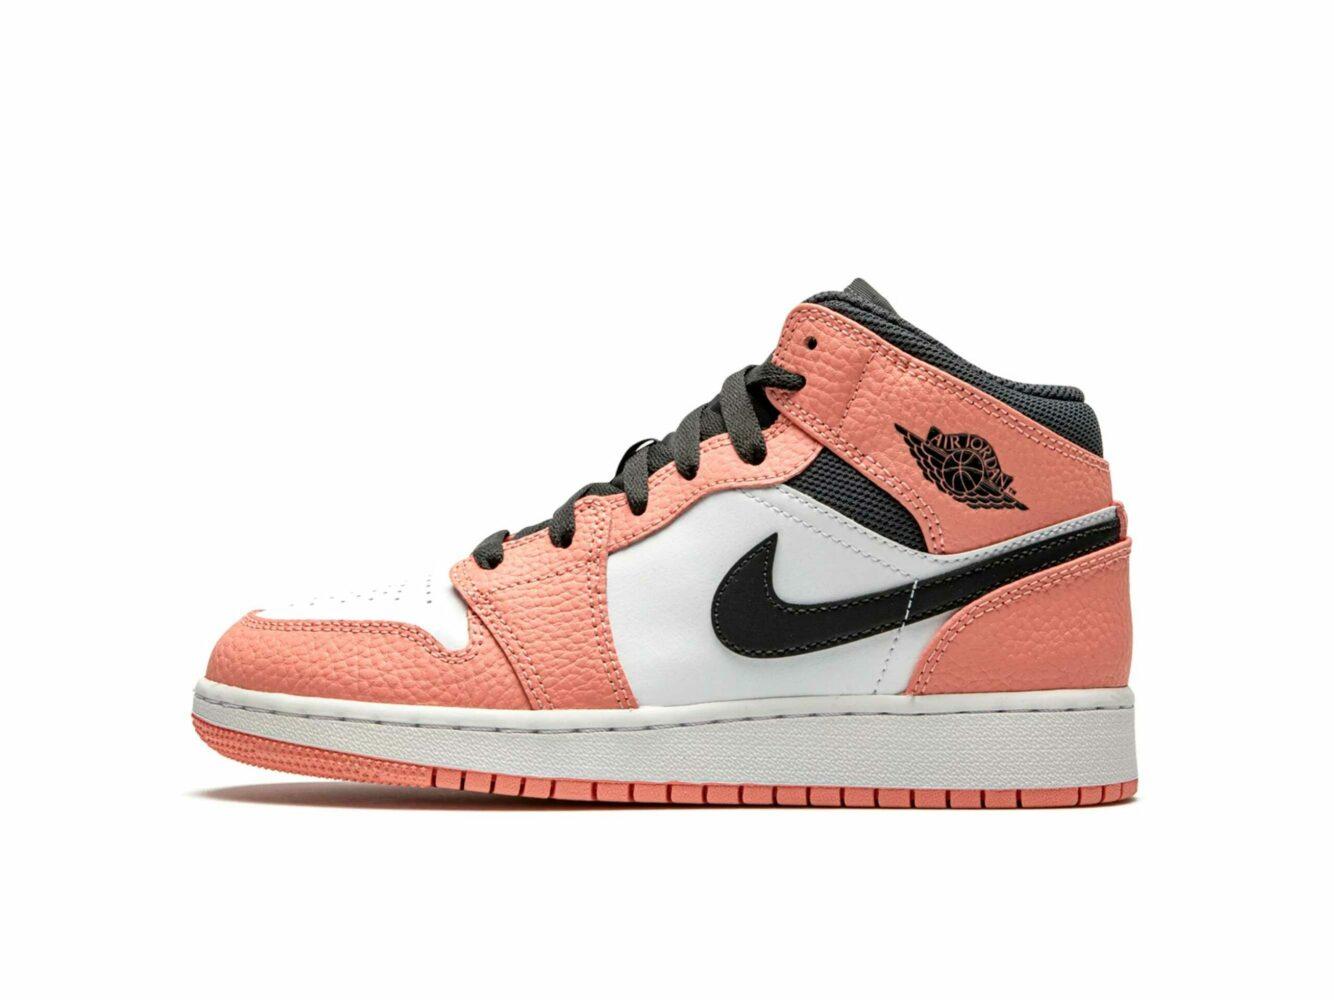 nike air jordan 1 mid GS pink quartz 555112_603 купить